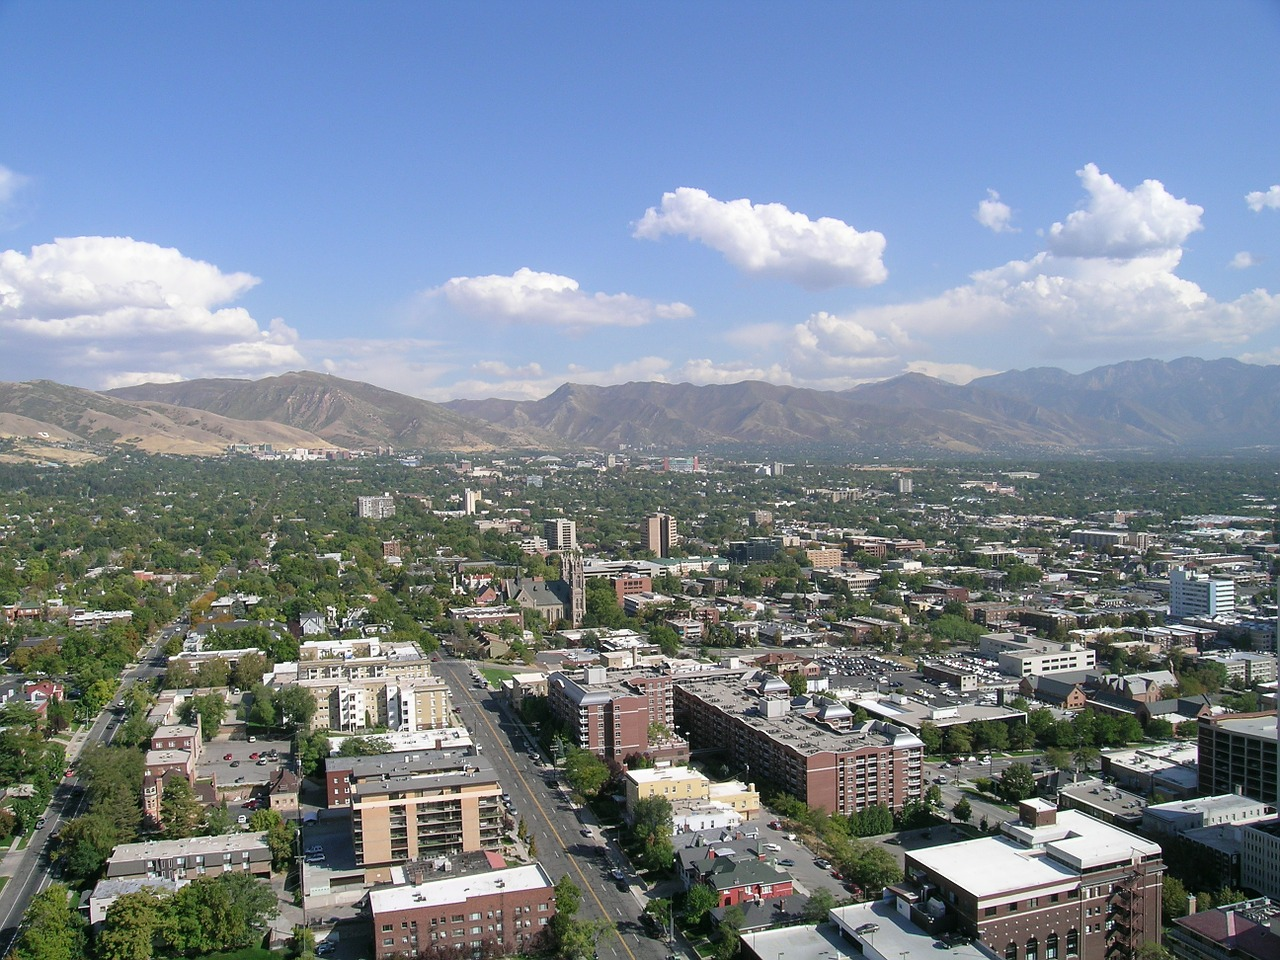 SVN® Adds Franchise in Salt Lake City